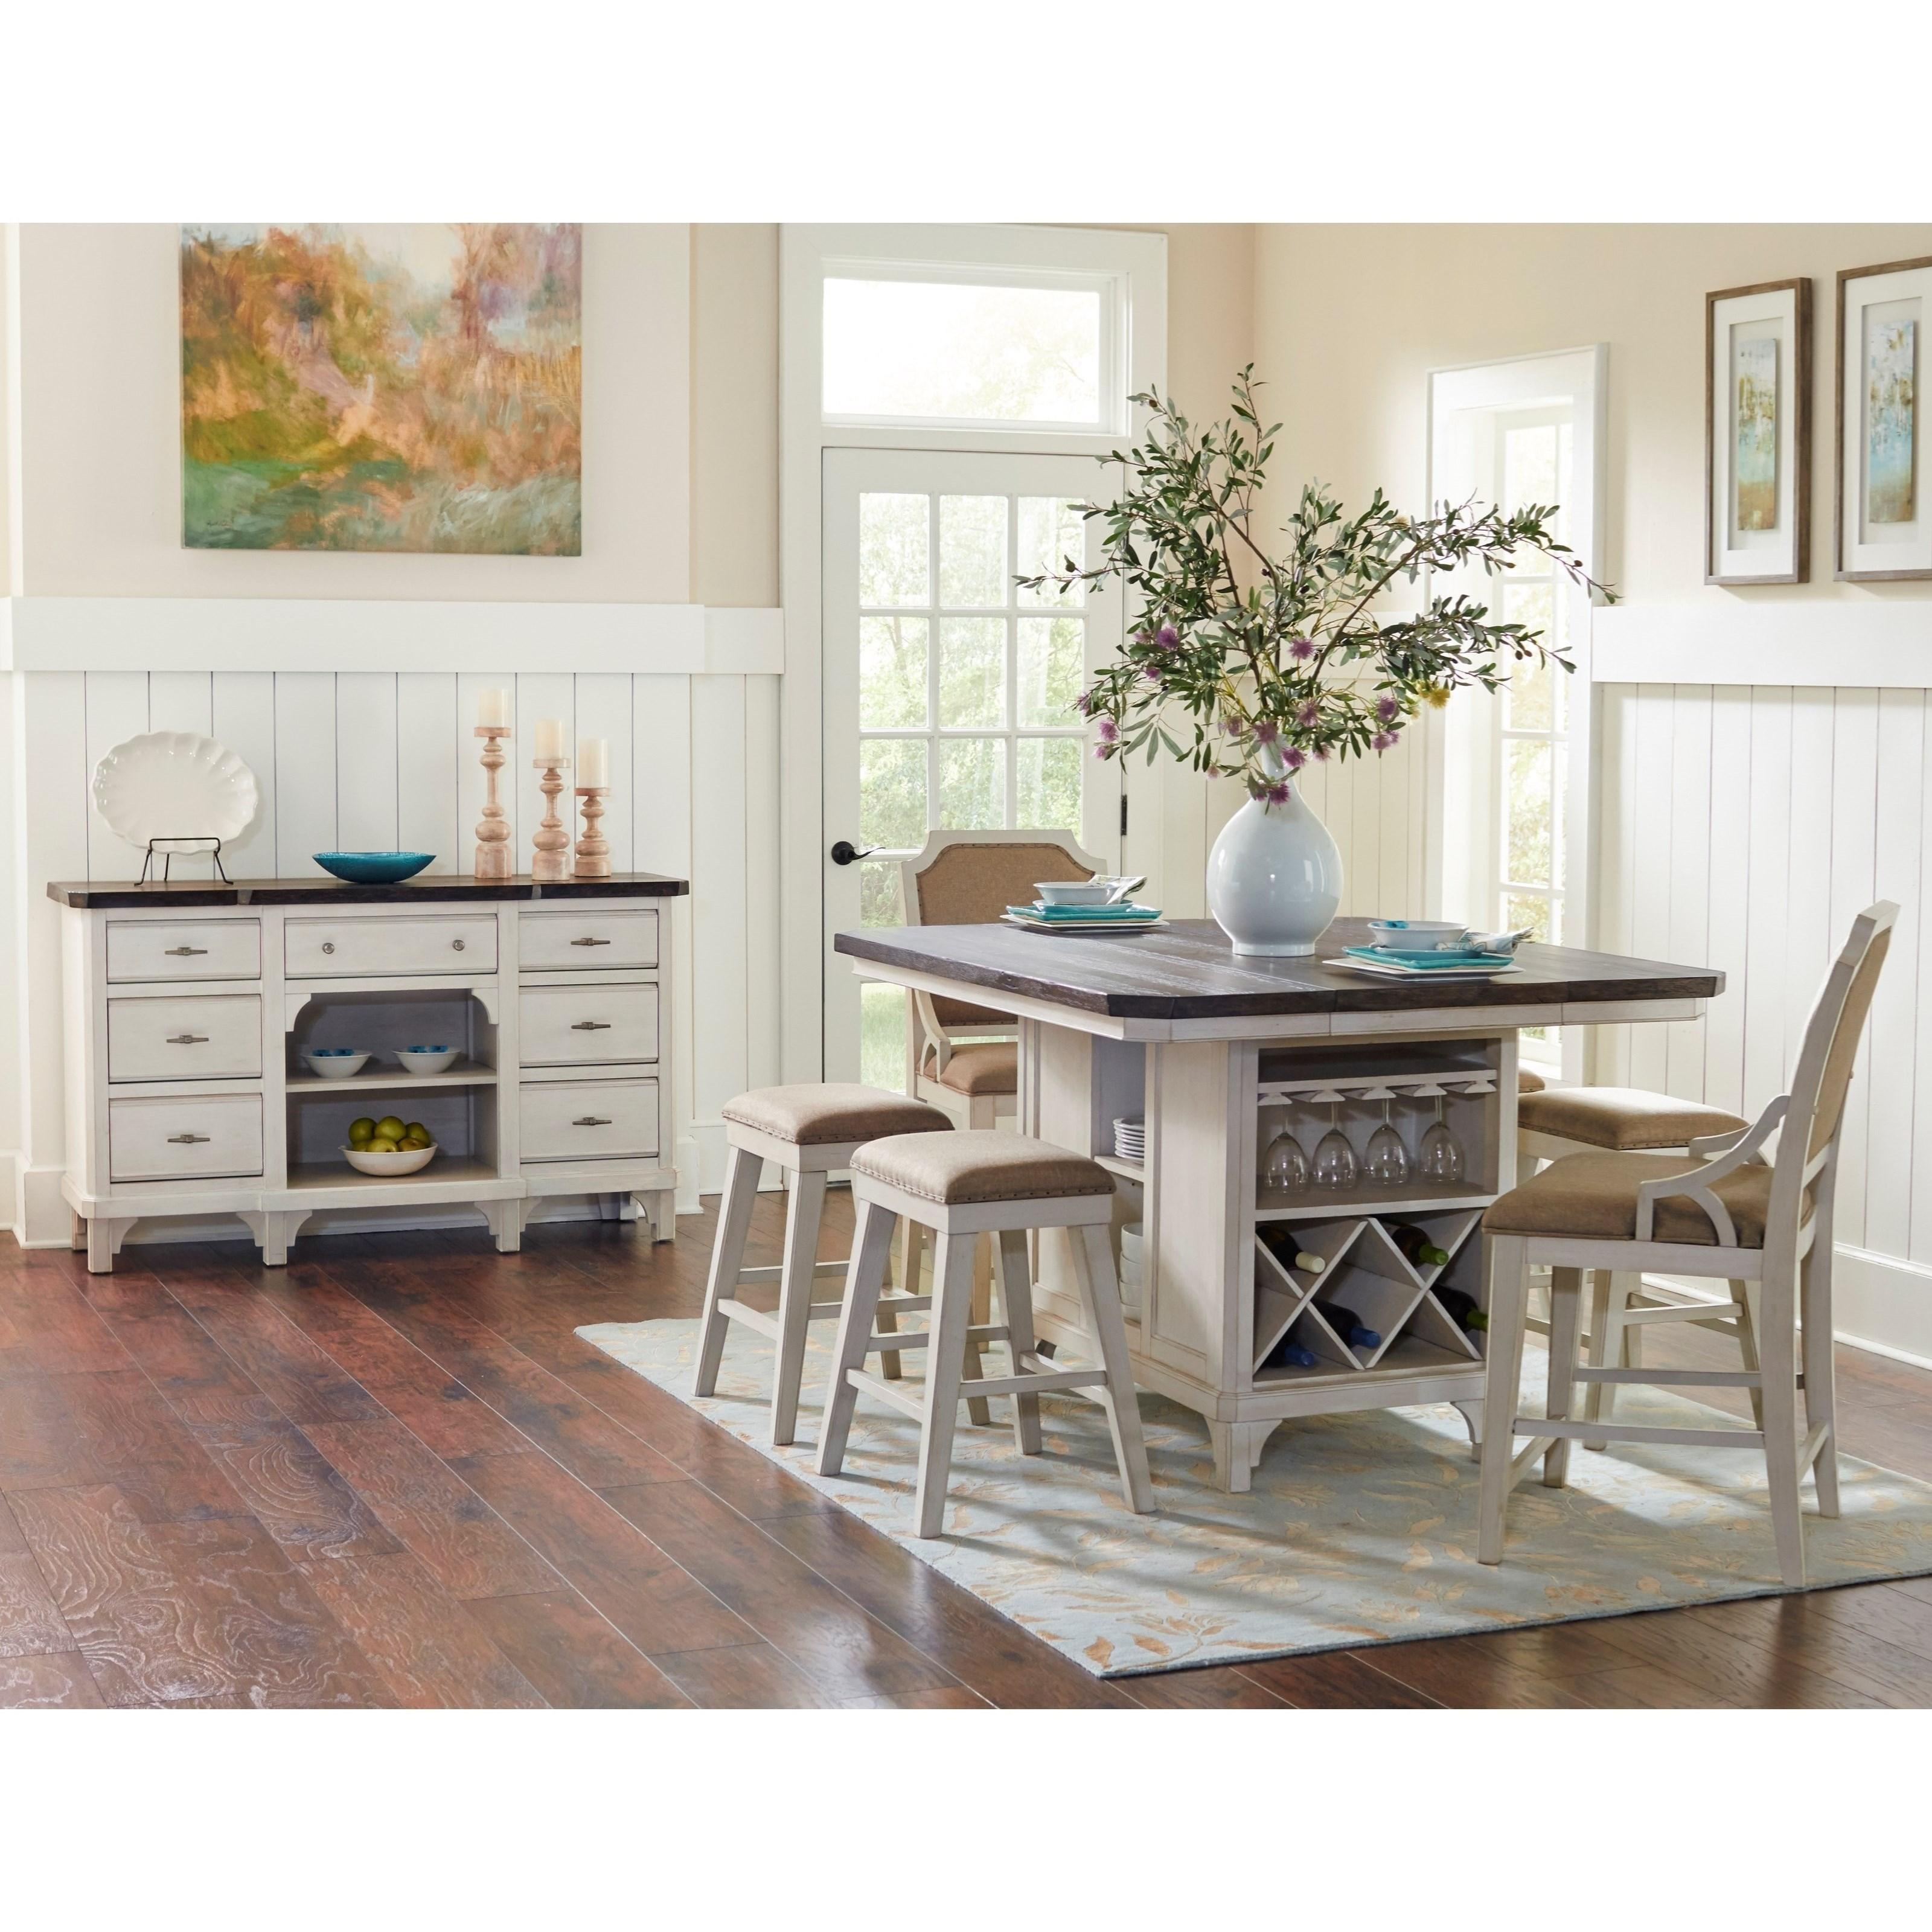 Avalon Furniture Mystic Cay 7 Piece Kitchen Island Table